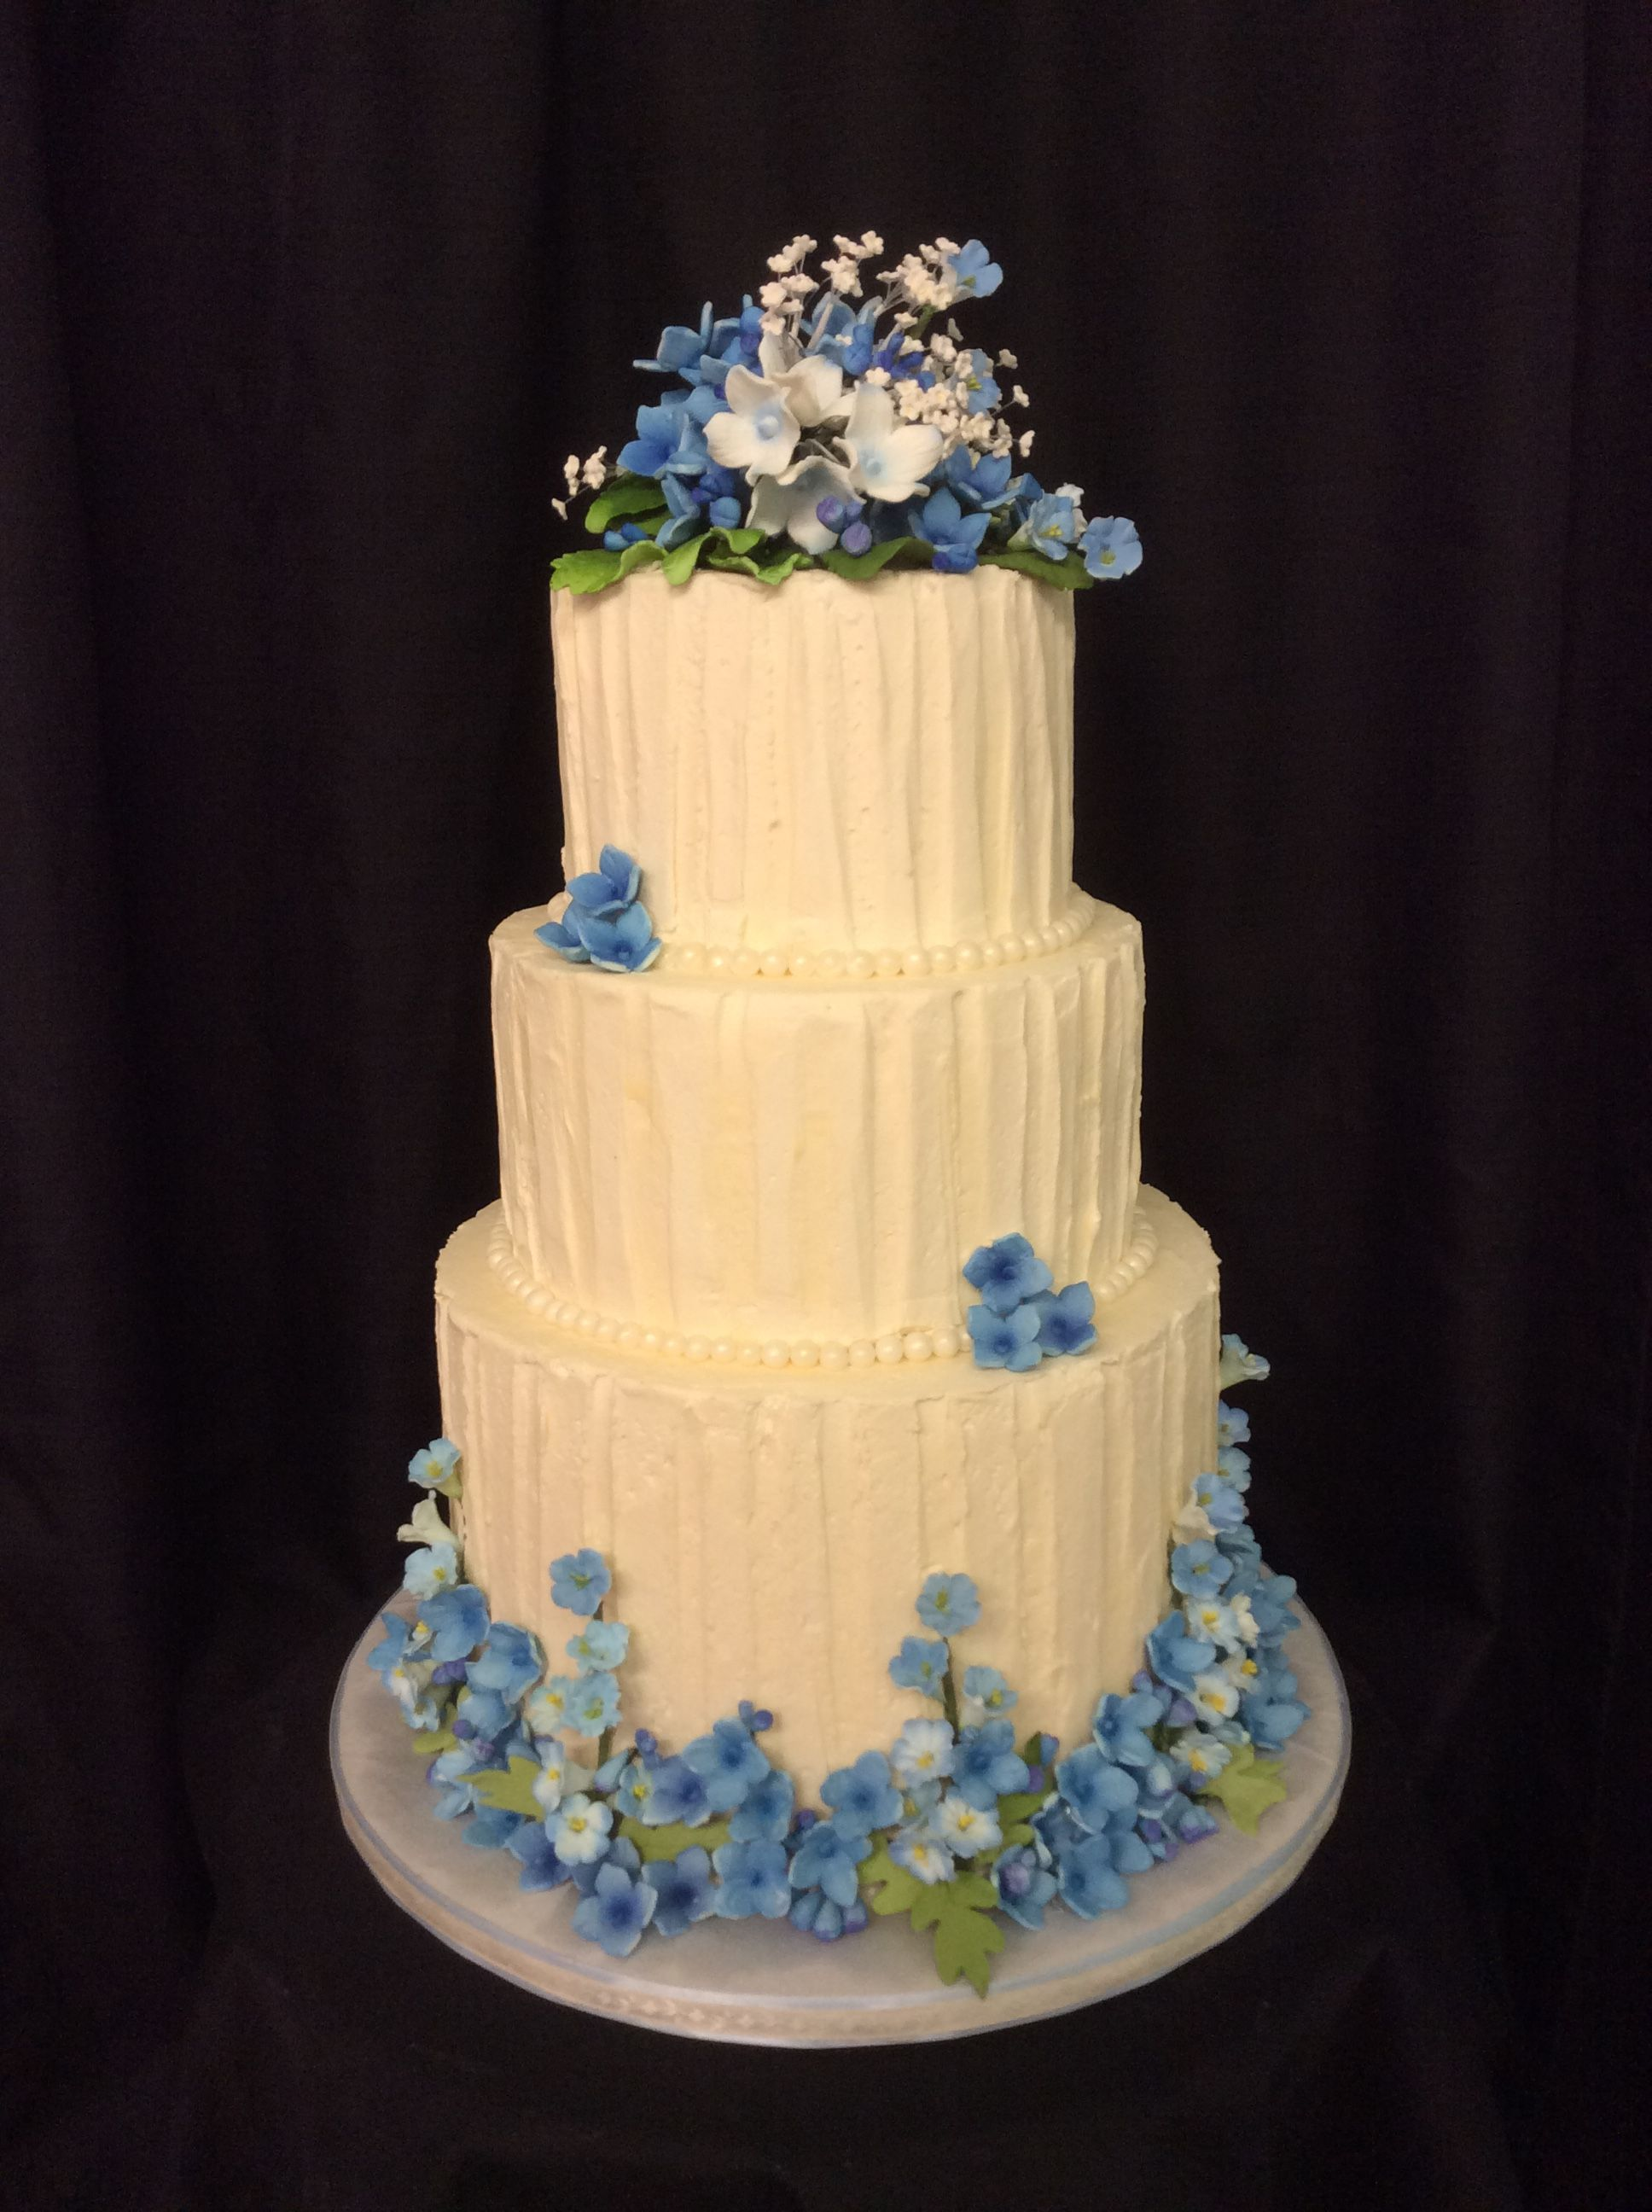 buttercream cake with blue sugar hydrangeas | Cake decor | Pinterest ...